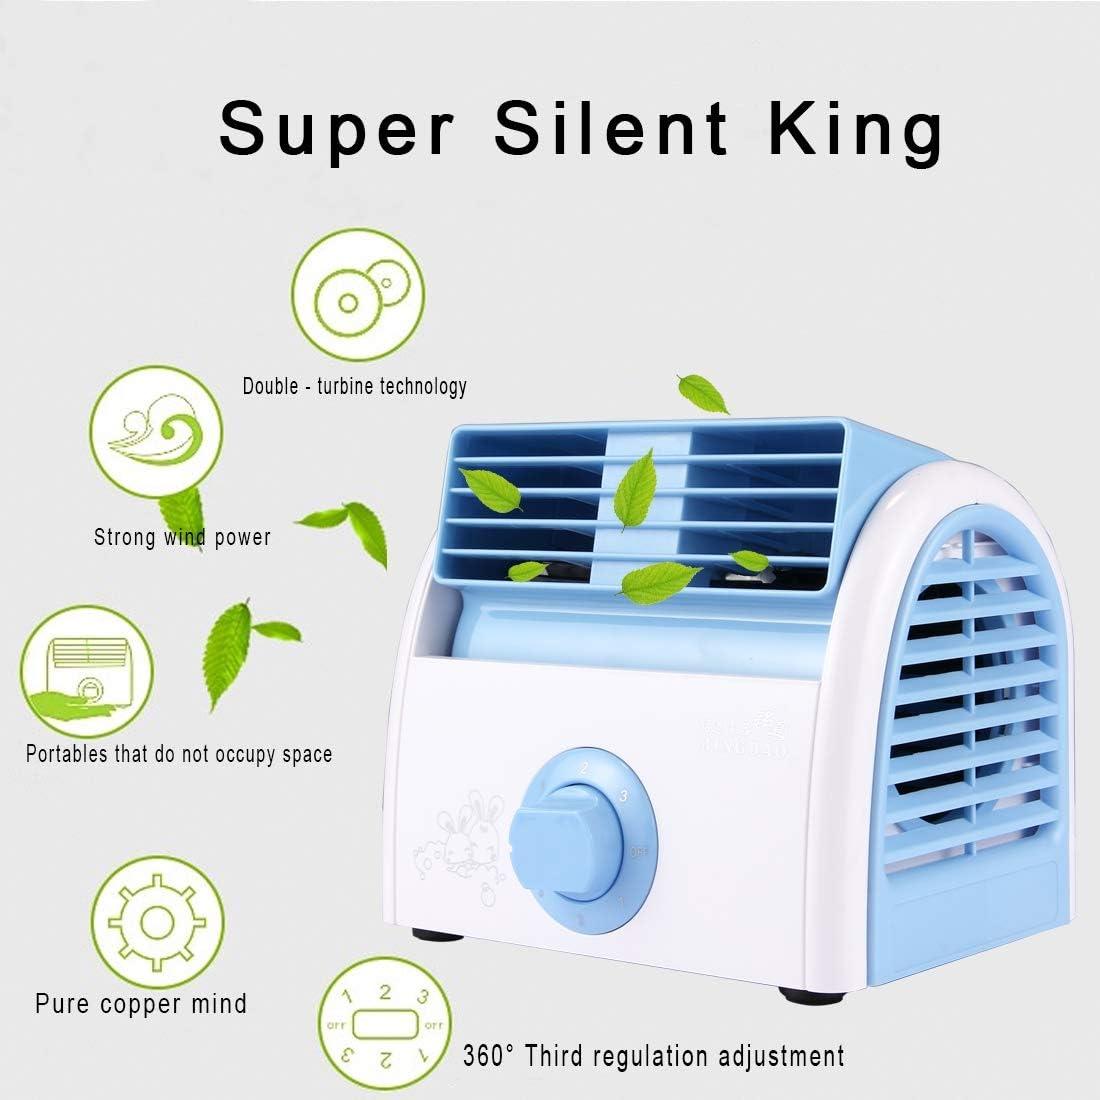 Pink AC 220V Color : Green Hard Comfortable Shockproof Protective case 30W Turbine No Blade Mini Desktop Mute Fan for Dormitory//Bedroom//Living Room//Office 3 Kinds Speed Mode